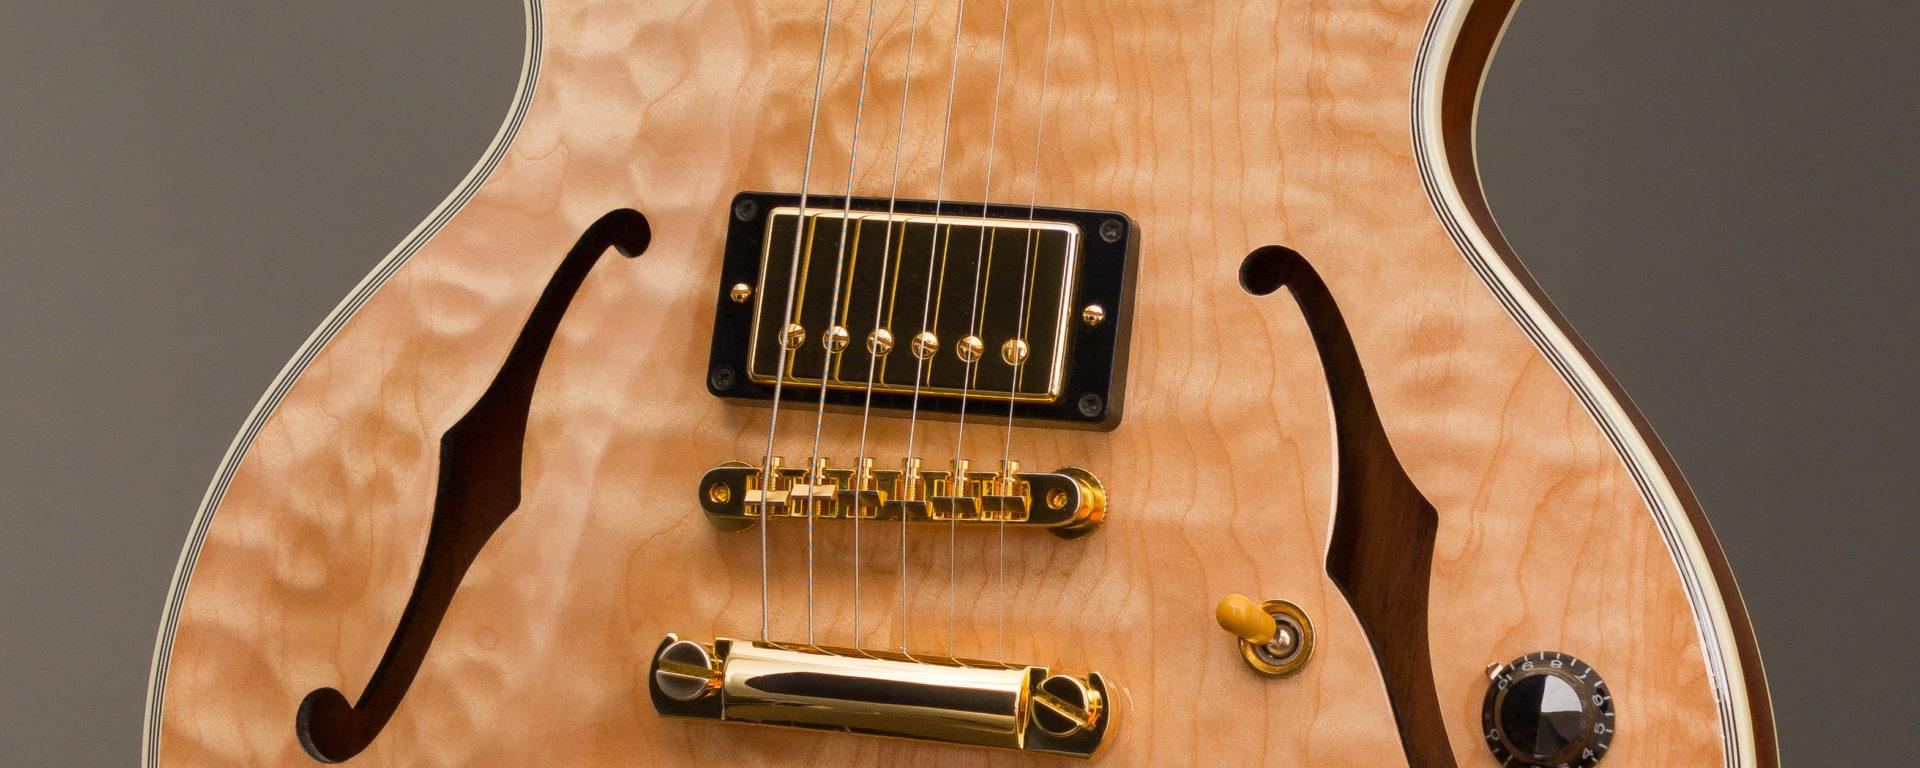 Gibson Guitars - 2011 Custom Shop CS-356 Q - Used